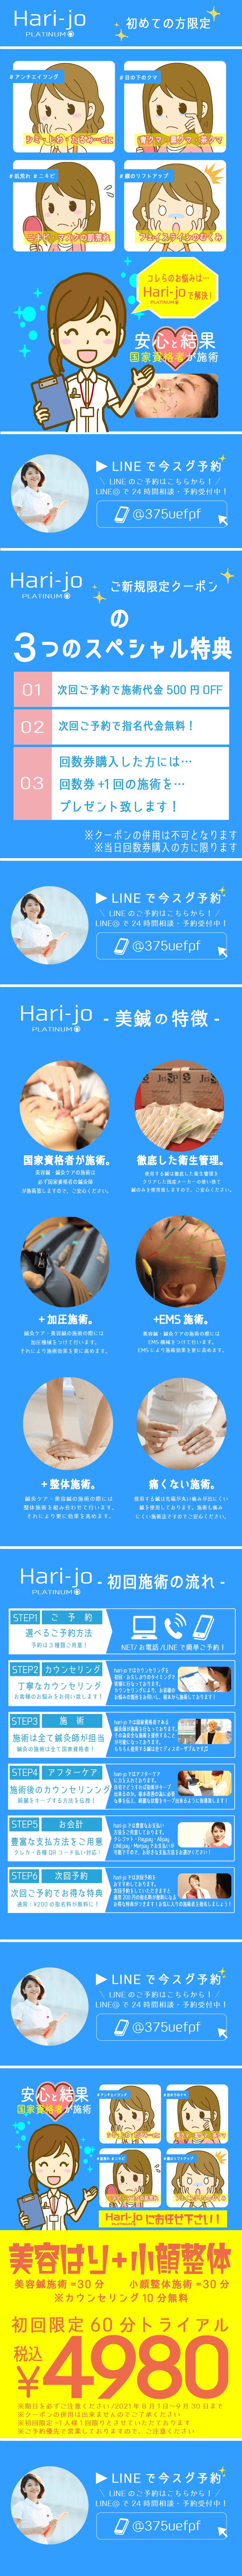 Hari-jo8-9月限定クーポン美容鍼+小顔整体60分トライアルコース4980円説明文章